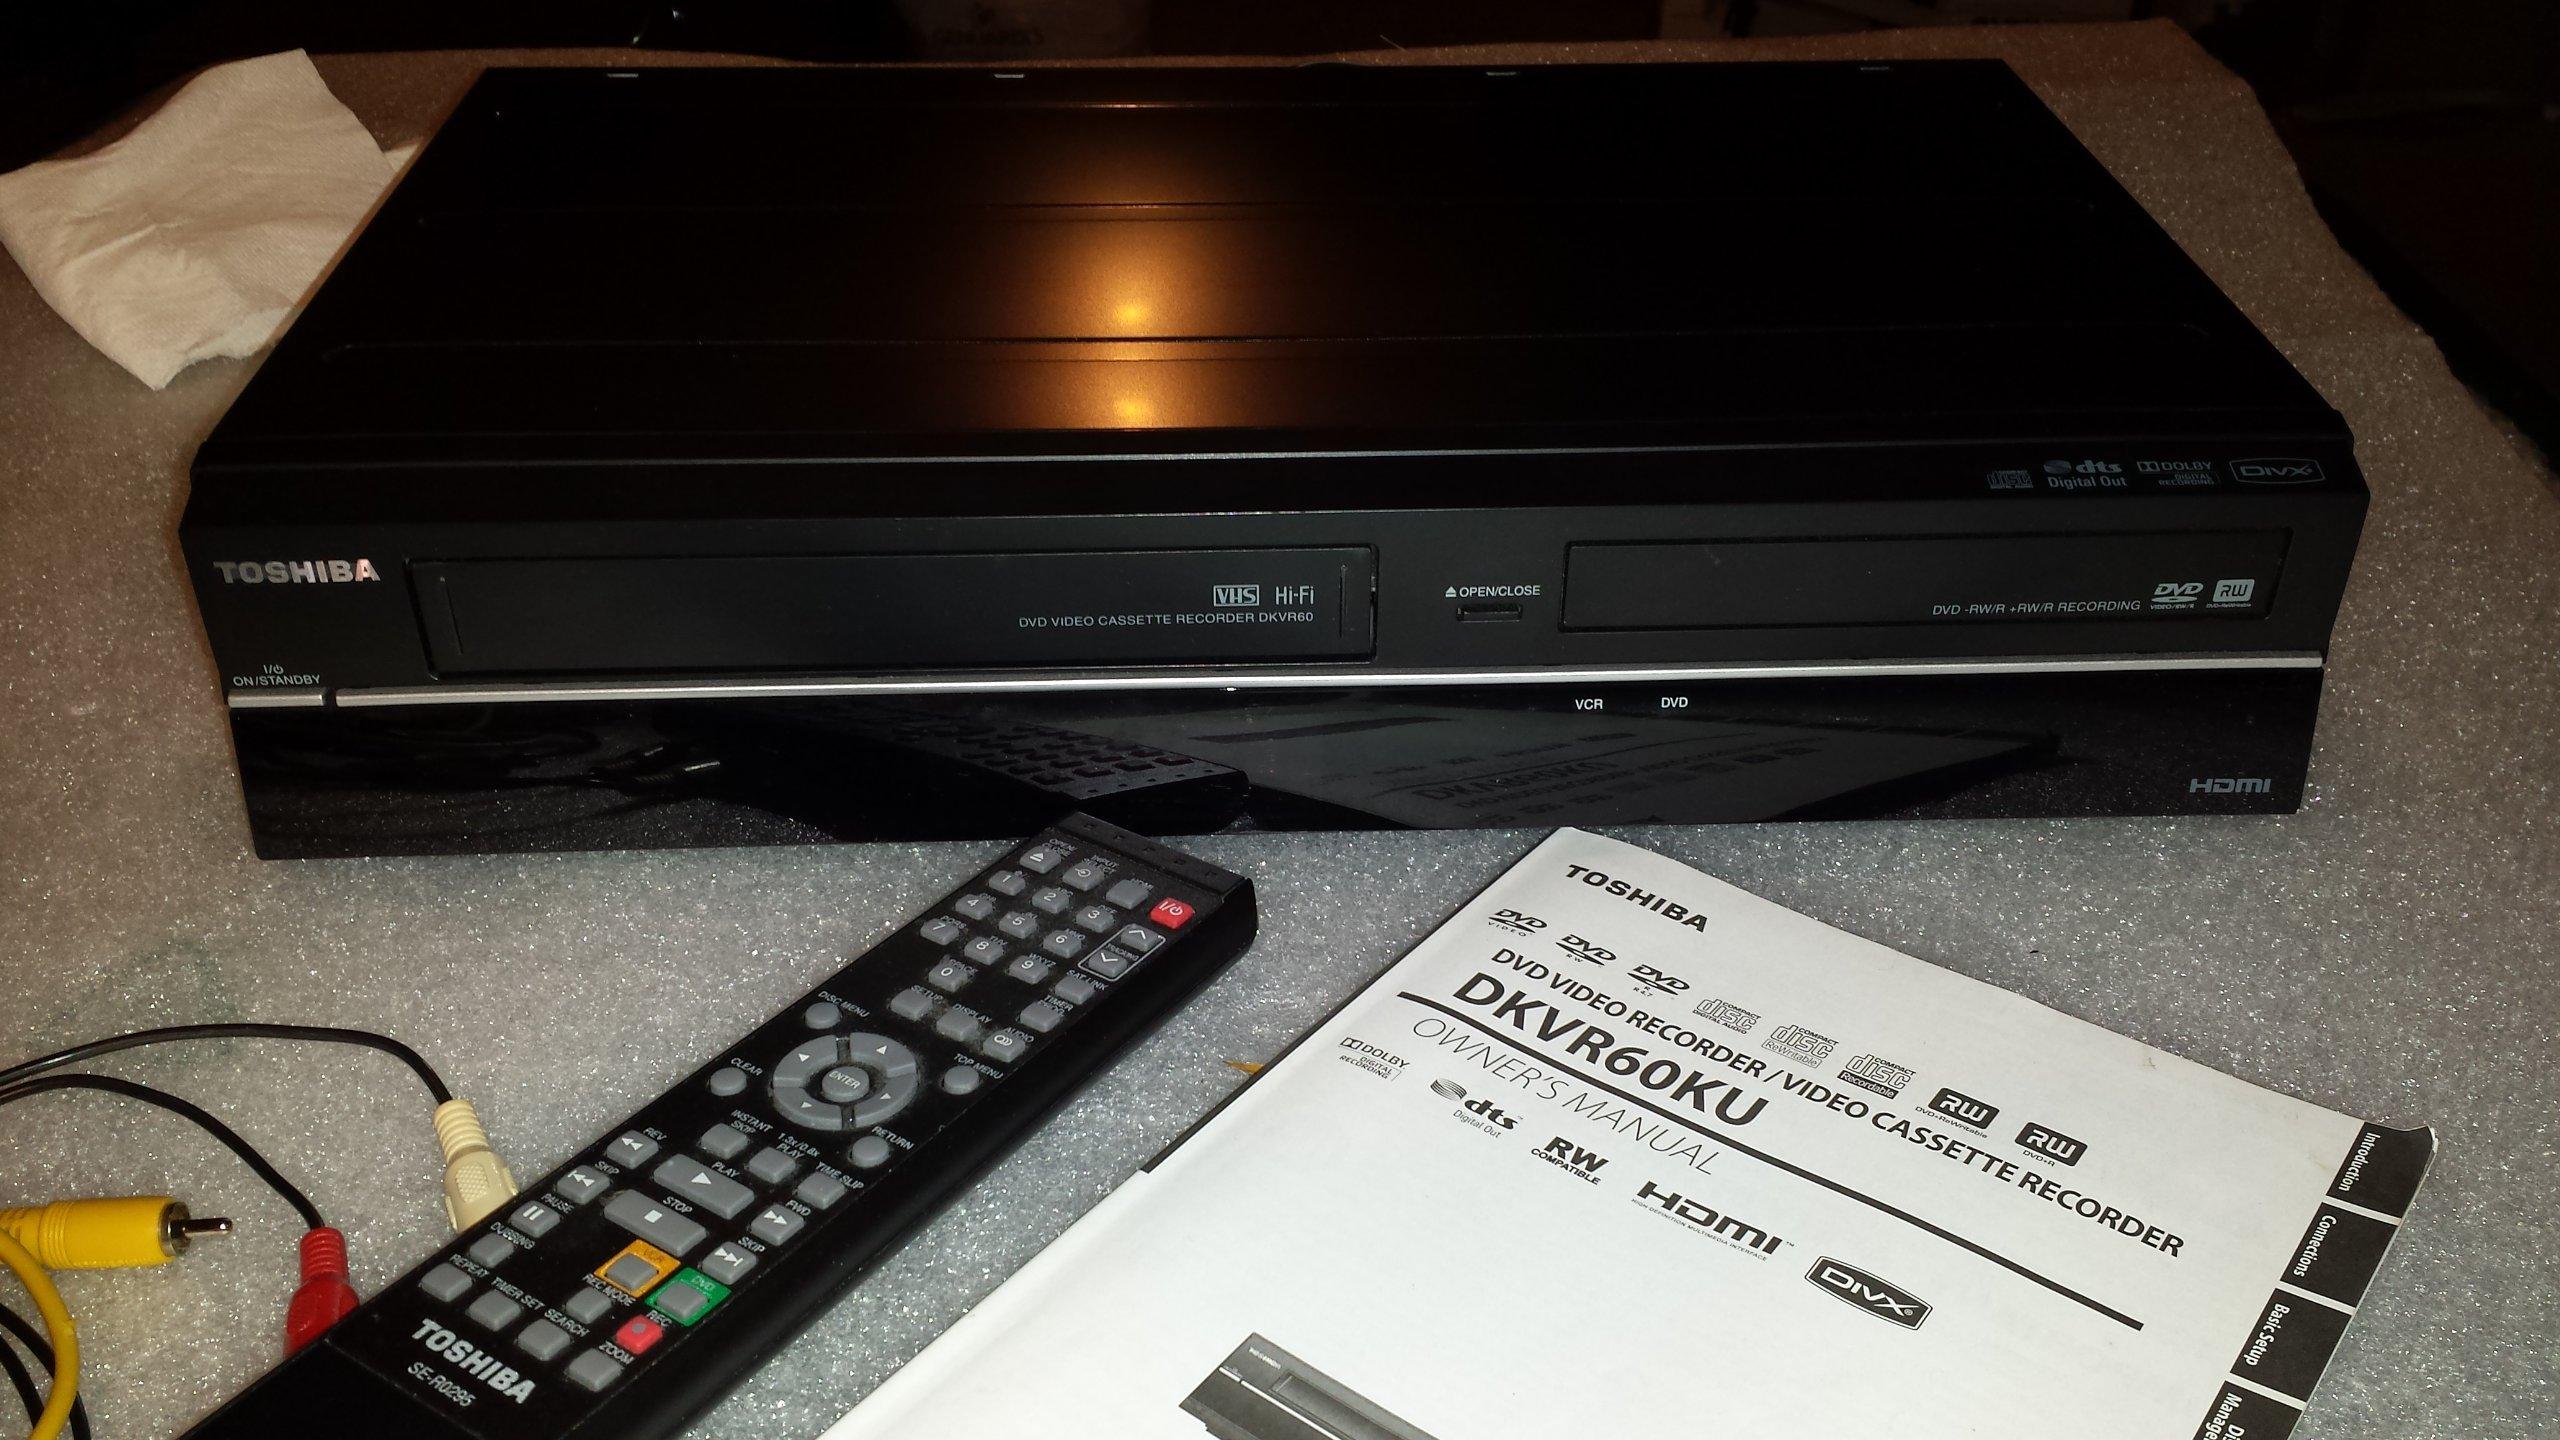 cheap toshiba combo dvd find toshiba combo dvd deals on line at rh guide alibaba com toshiba vhs/dvd recorder combo (dvr620) manual toshiba vhs dvd recorder combo manual